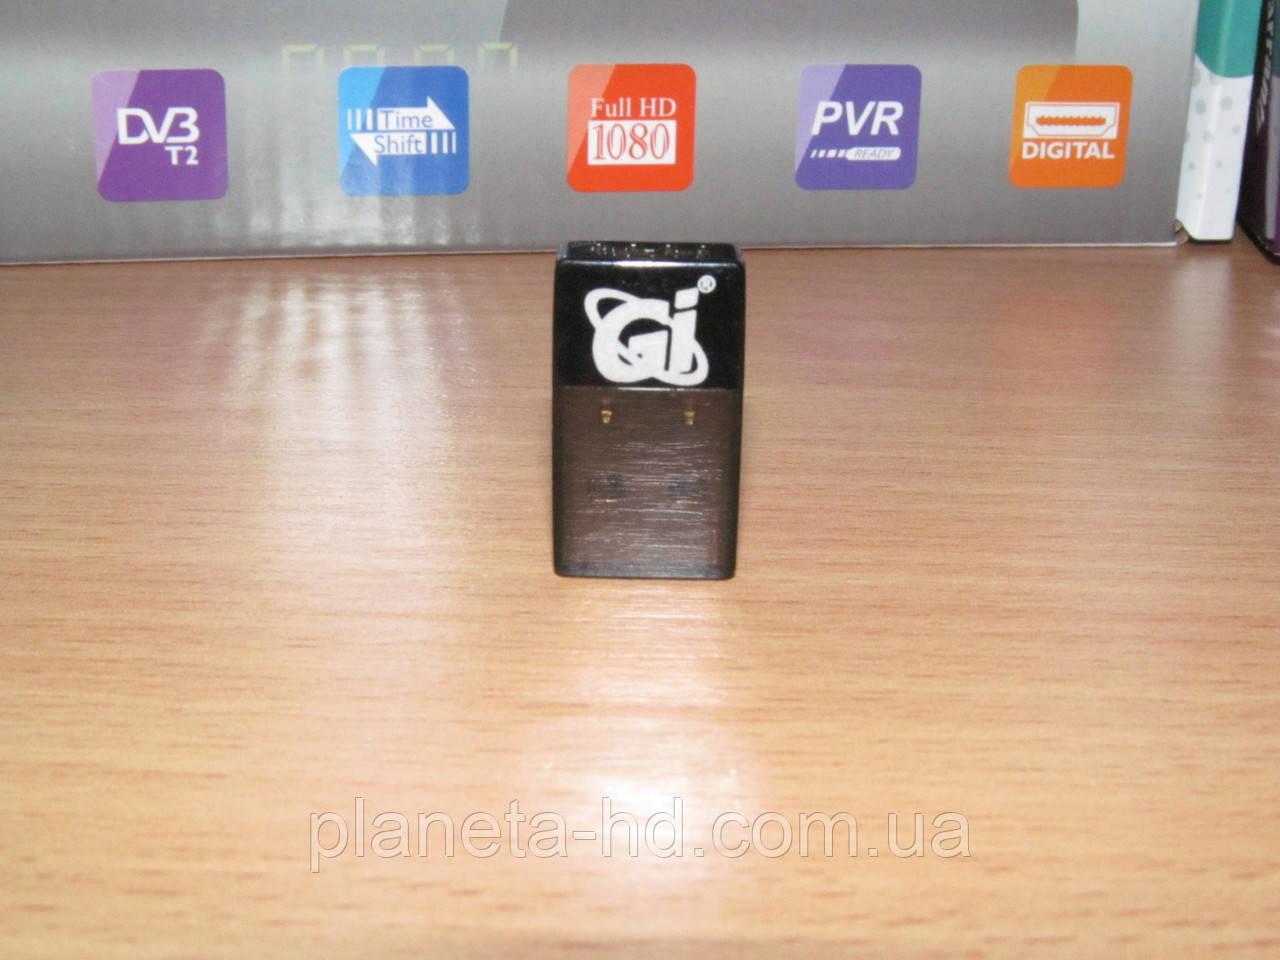 Wi-Fi адаптер GI MT7601 - Planeta-HD - магазин медиаплееров в Харькове